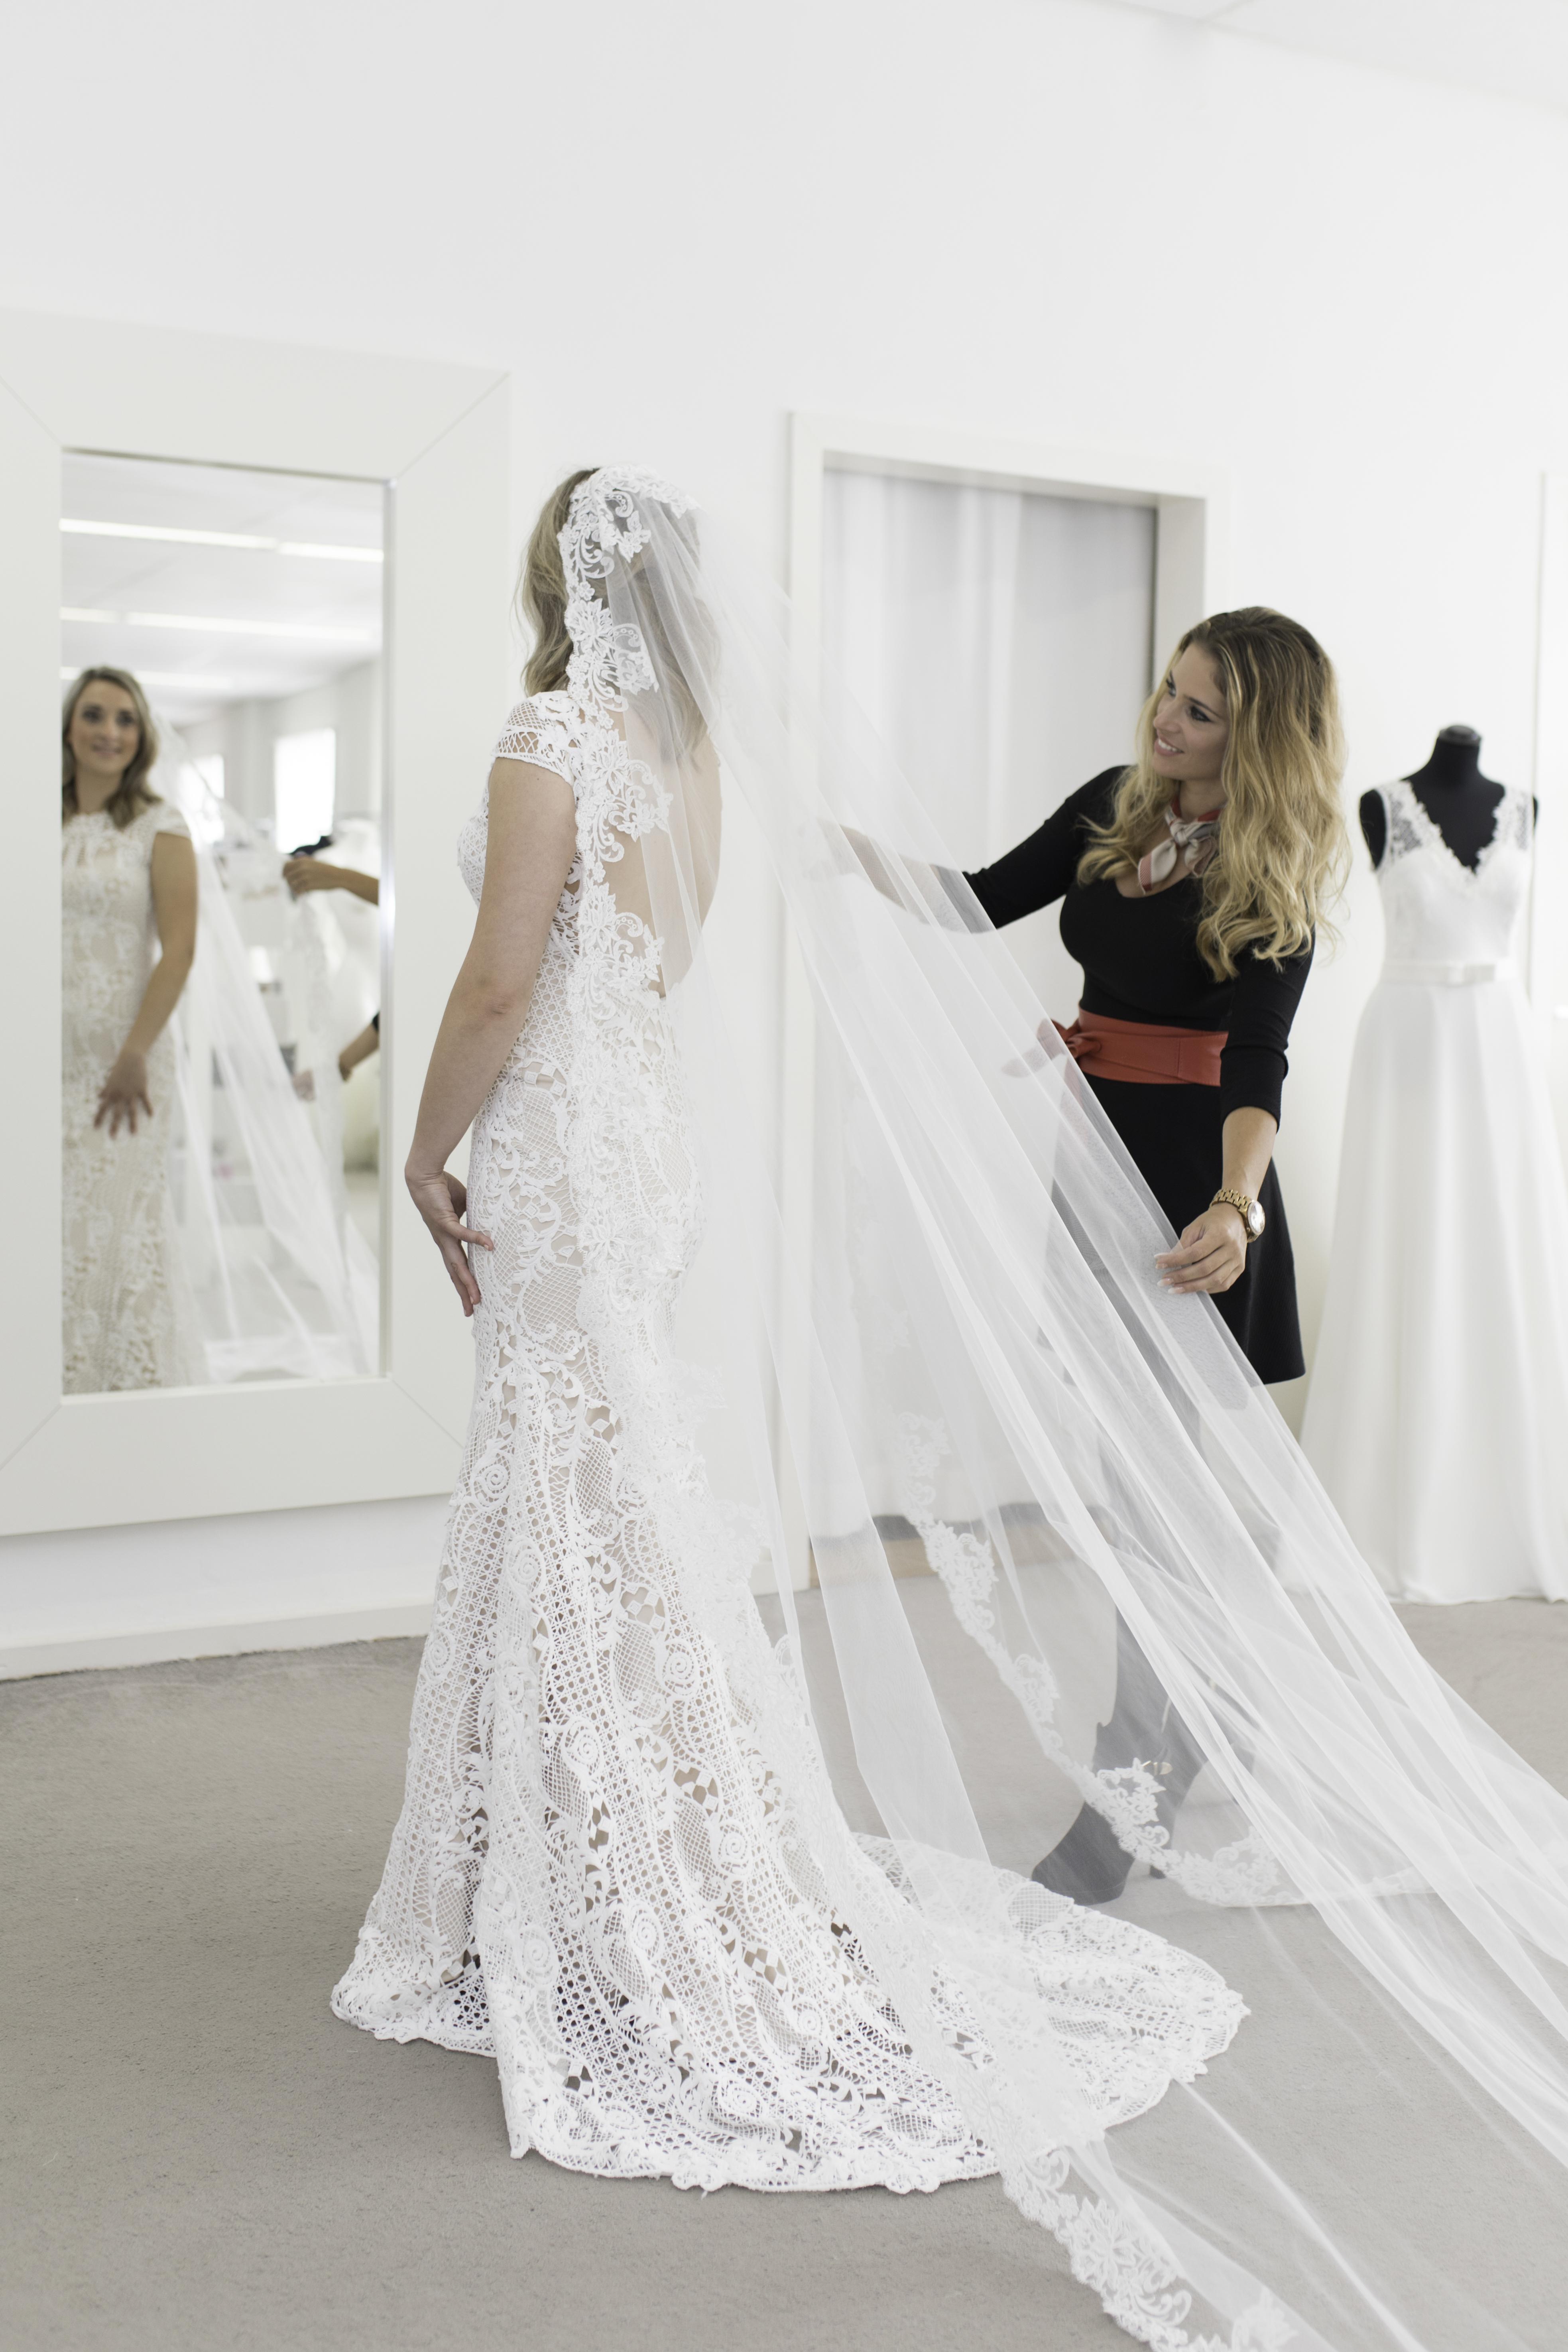 bruidsmode, trouwen, trouwjurk, bruidsjurk, vacature bruidswinkel, vacature bruidsmode